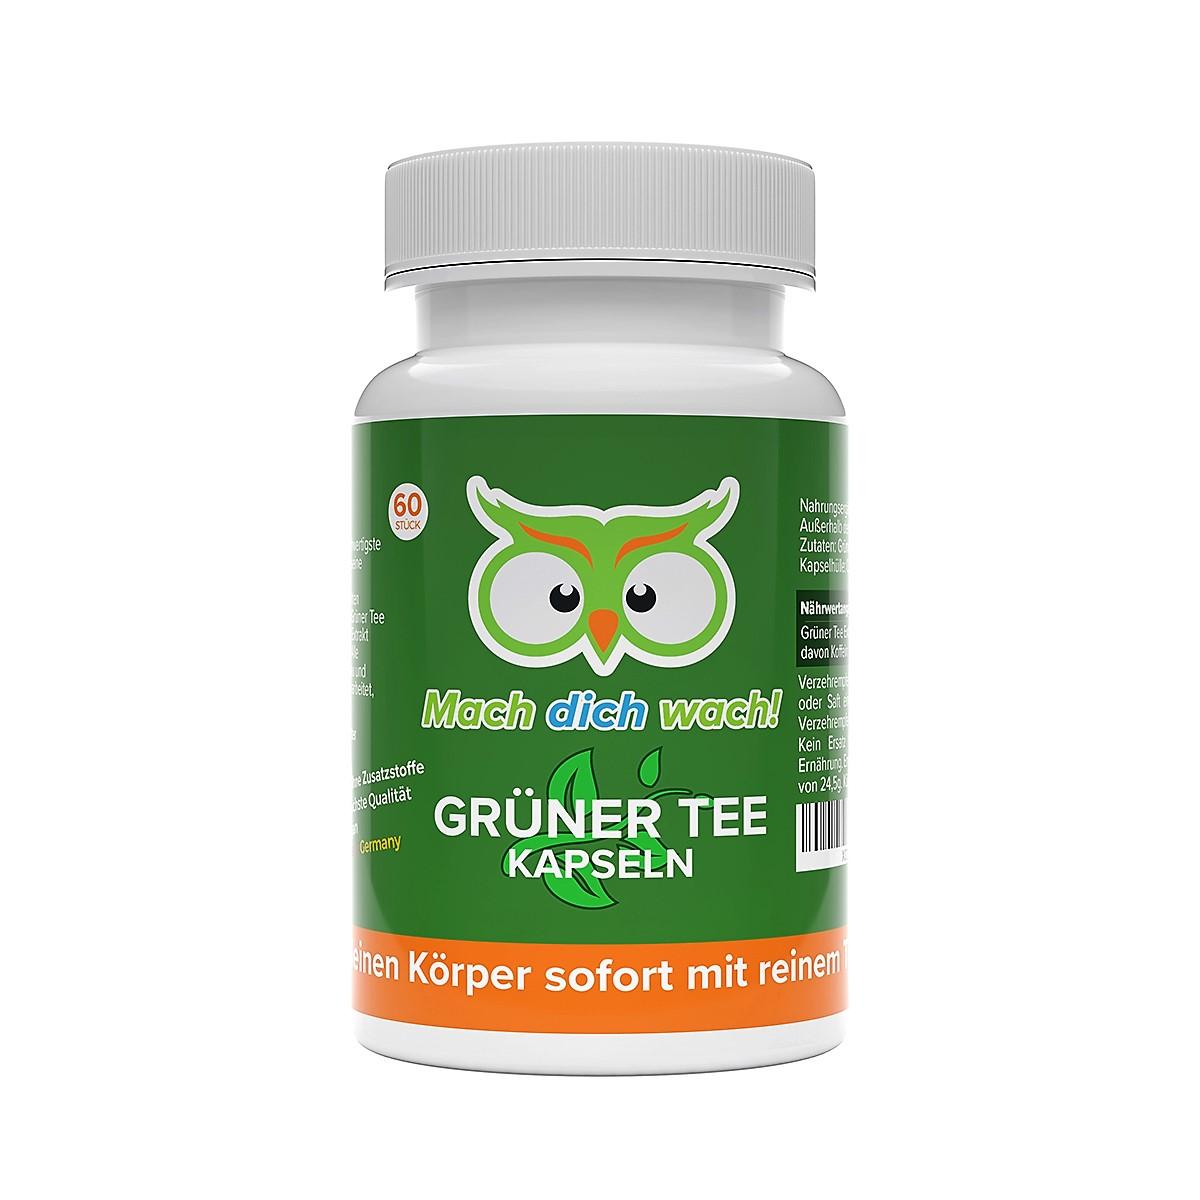 Grüner Tee Kapseln von Vitamineule